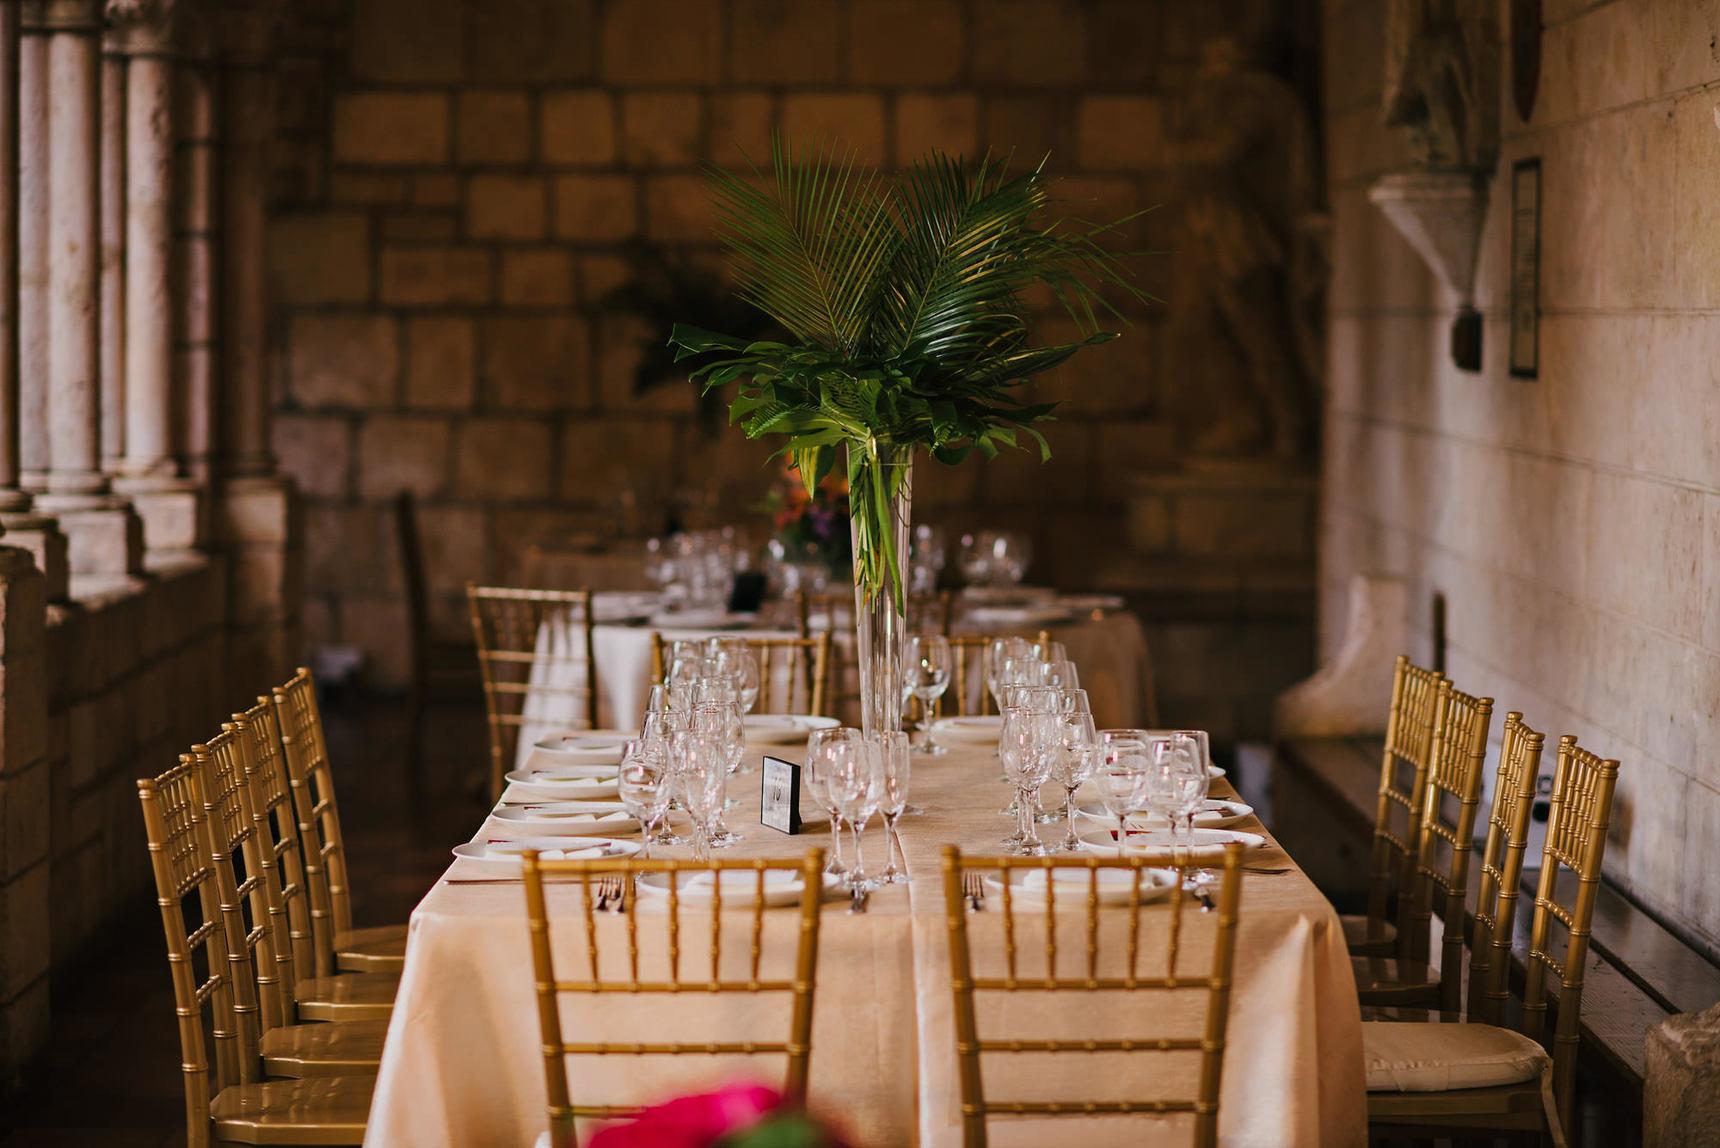 miami-luxury-catering-Wedding-Photography-81(pp_w1720_h1148).jpg